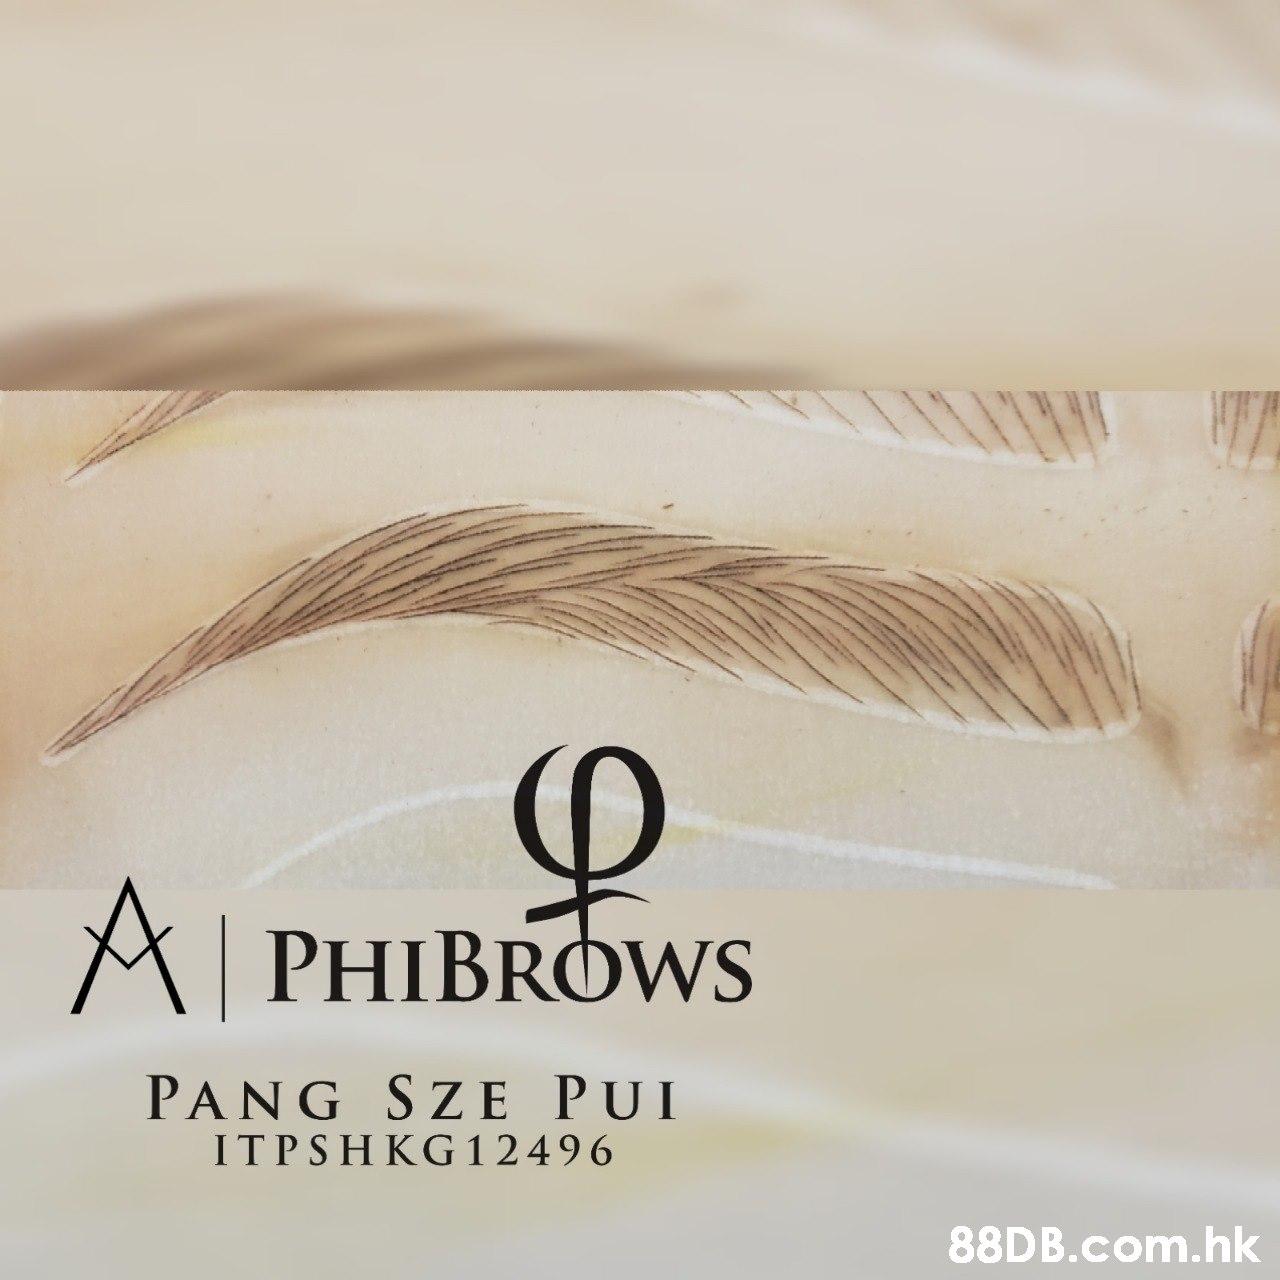 APHIBROWS PANG SZE PUI ITPSHKG 12496 .hk  Text,Eyebrow,Font,Eyelash,Beige